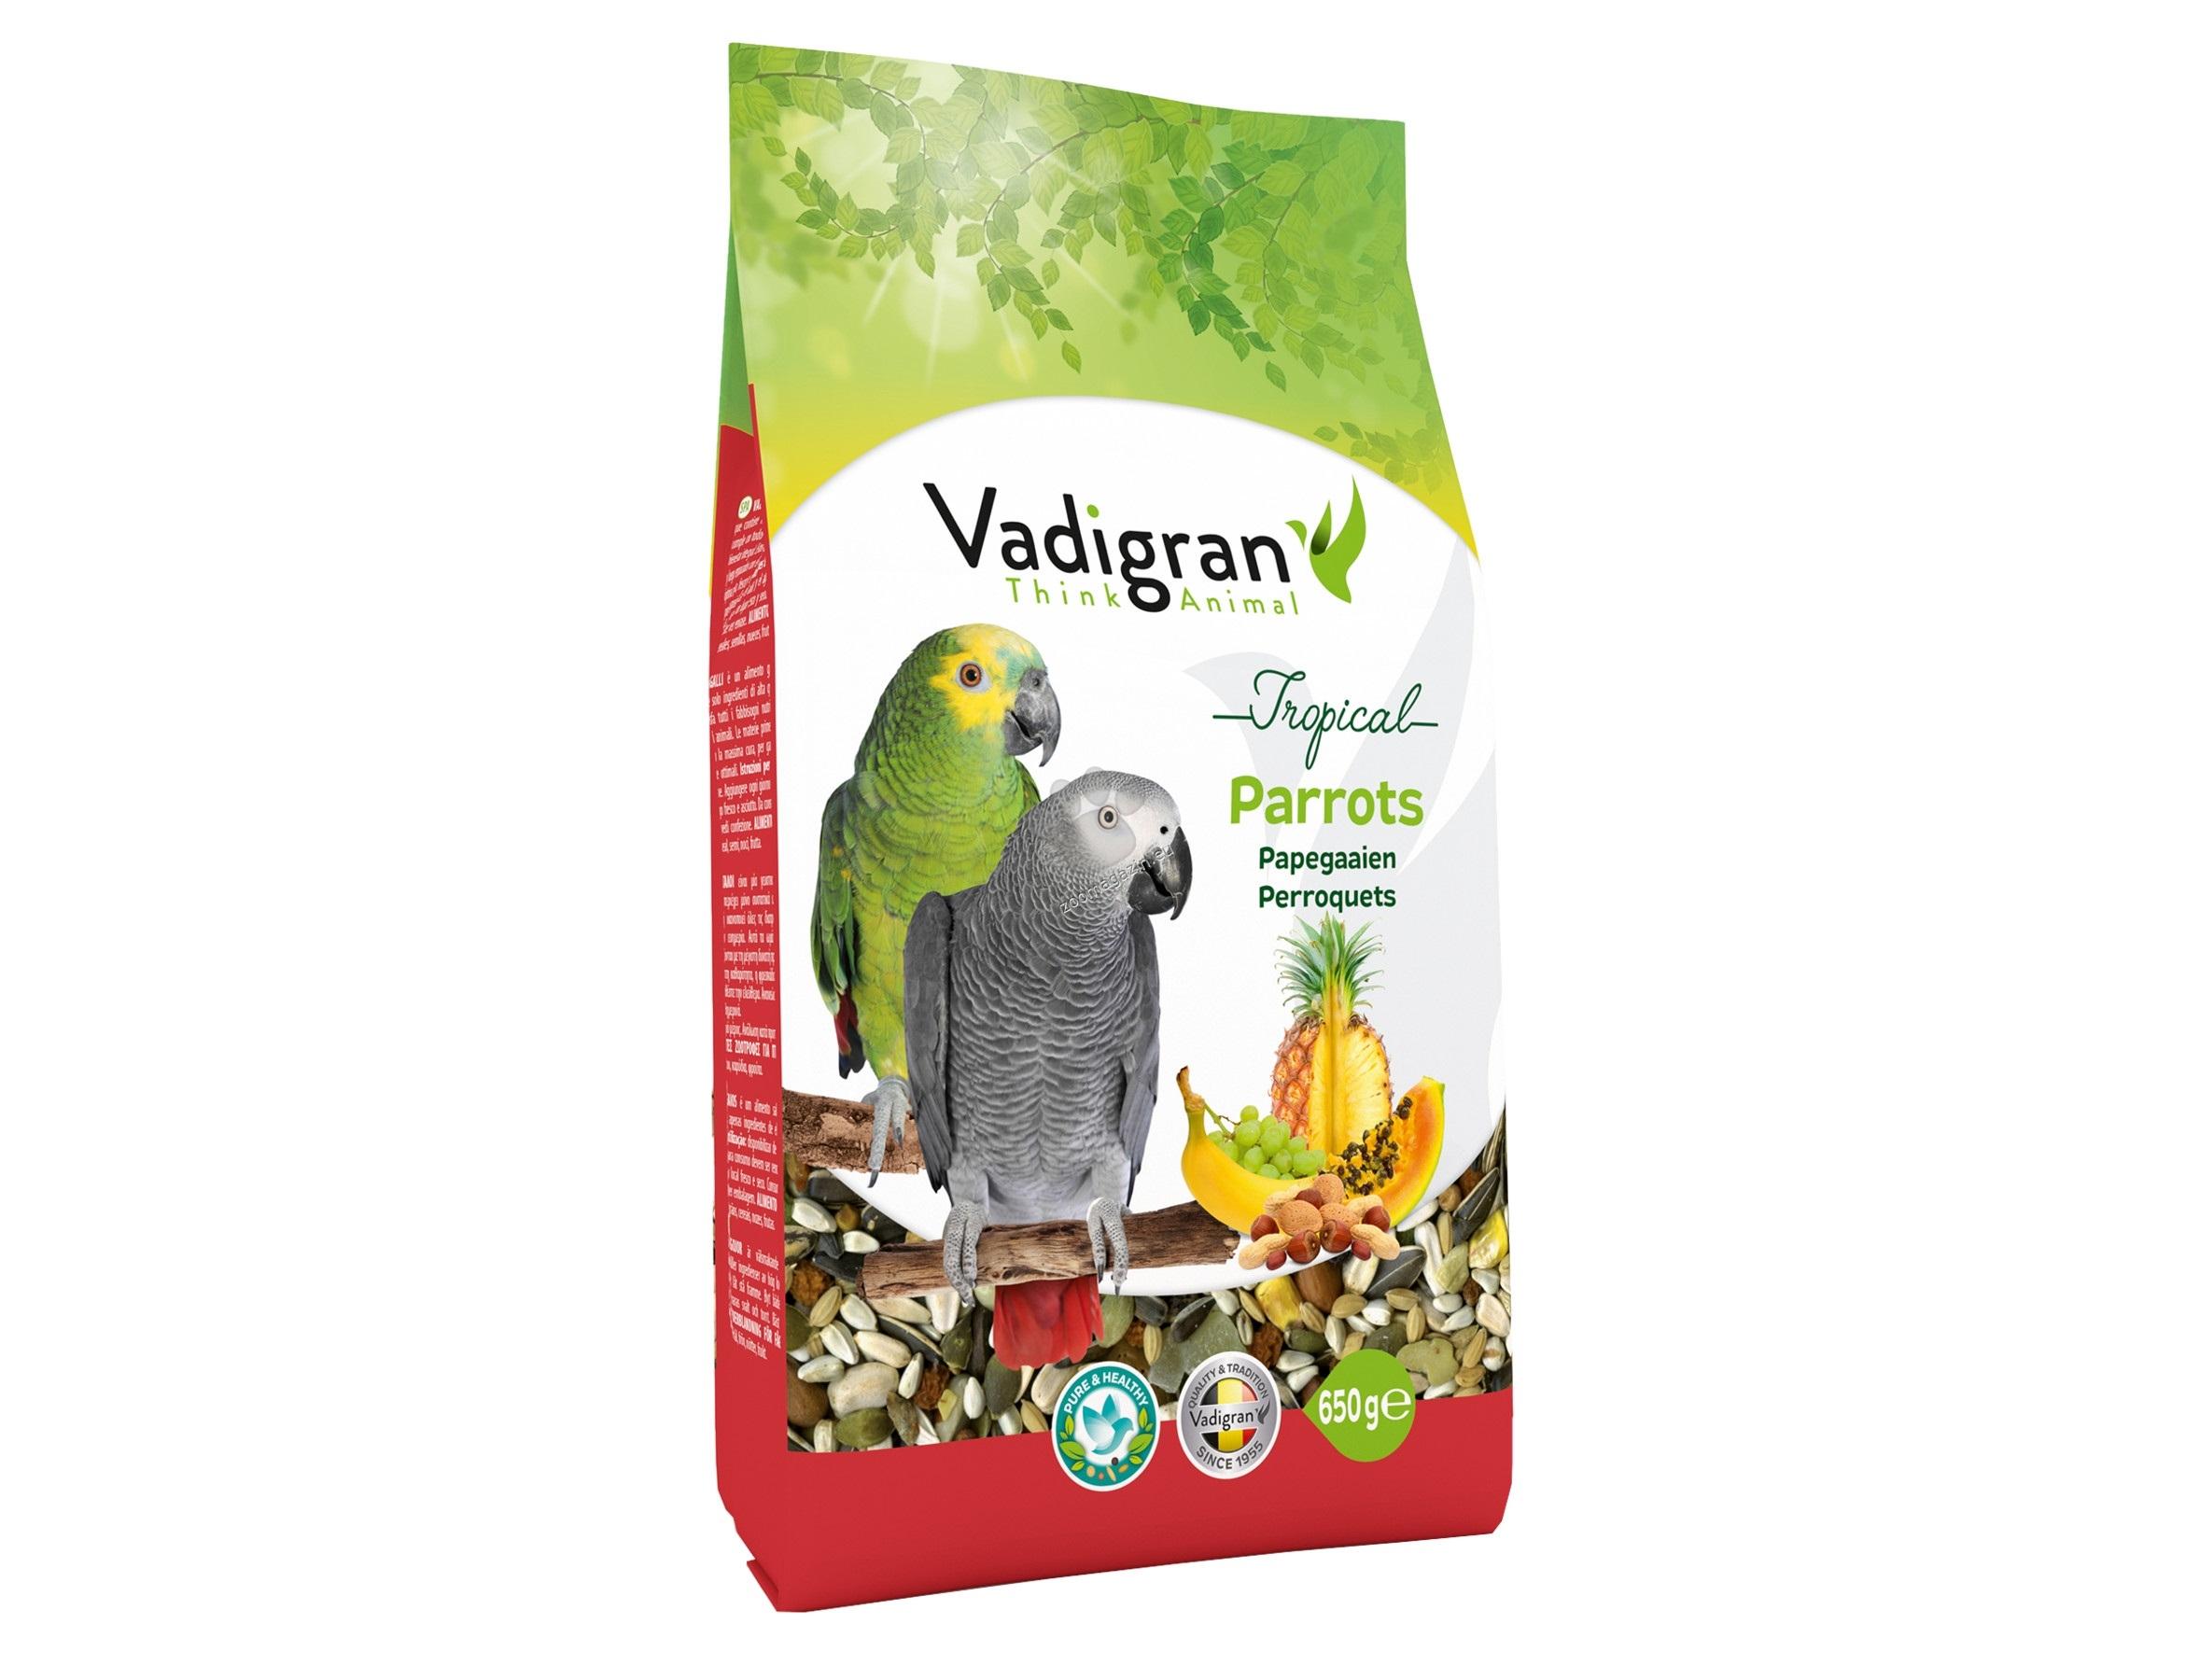 Vadigran - Tropical Parrot - пълноценна храна за големи папагали 650 гр.